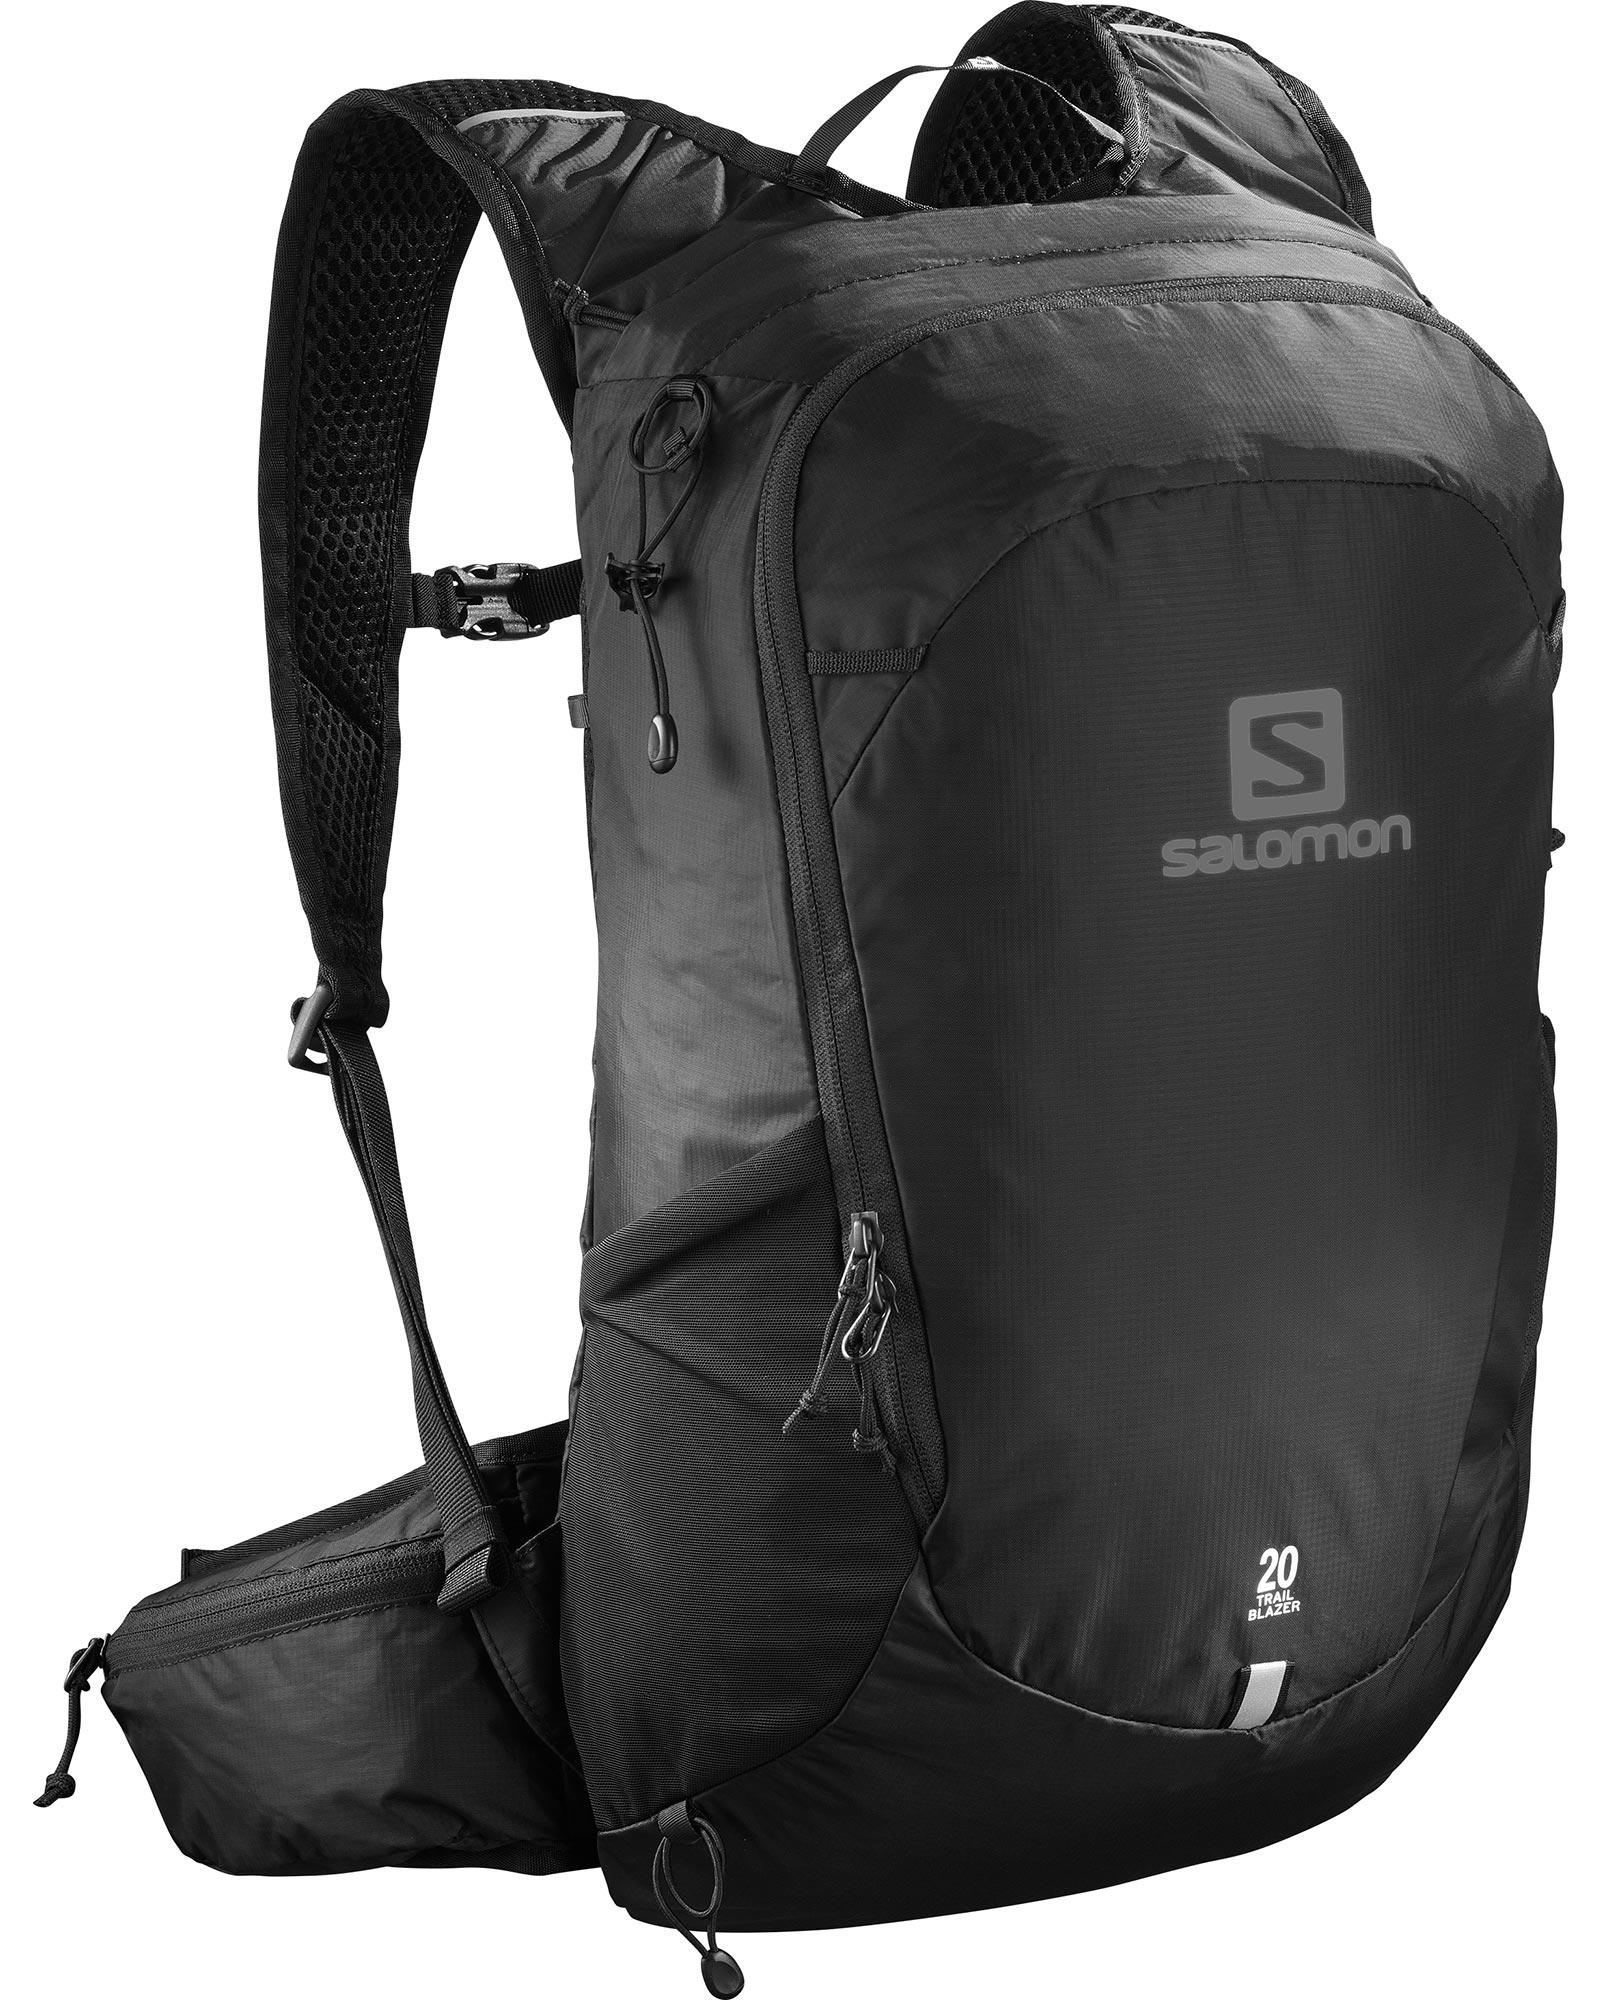 Salomon Trailblazer 20 Pack 0